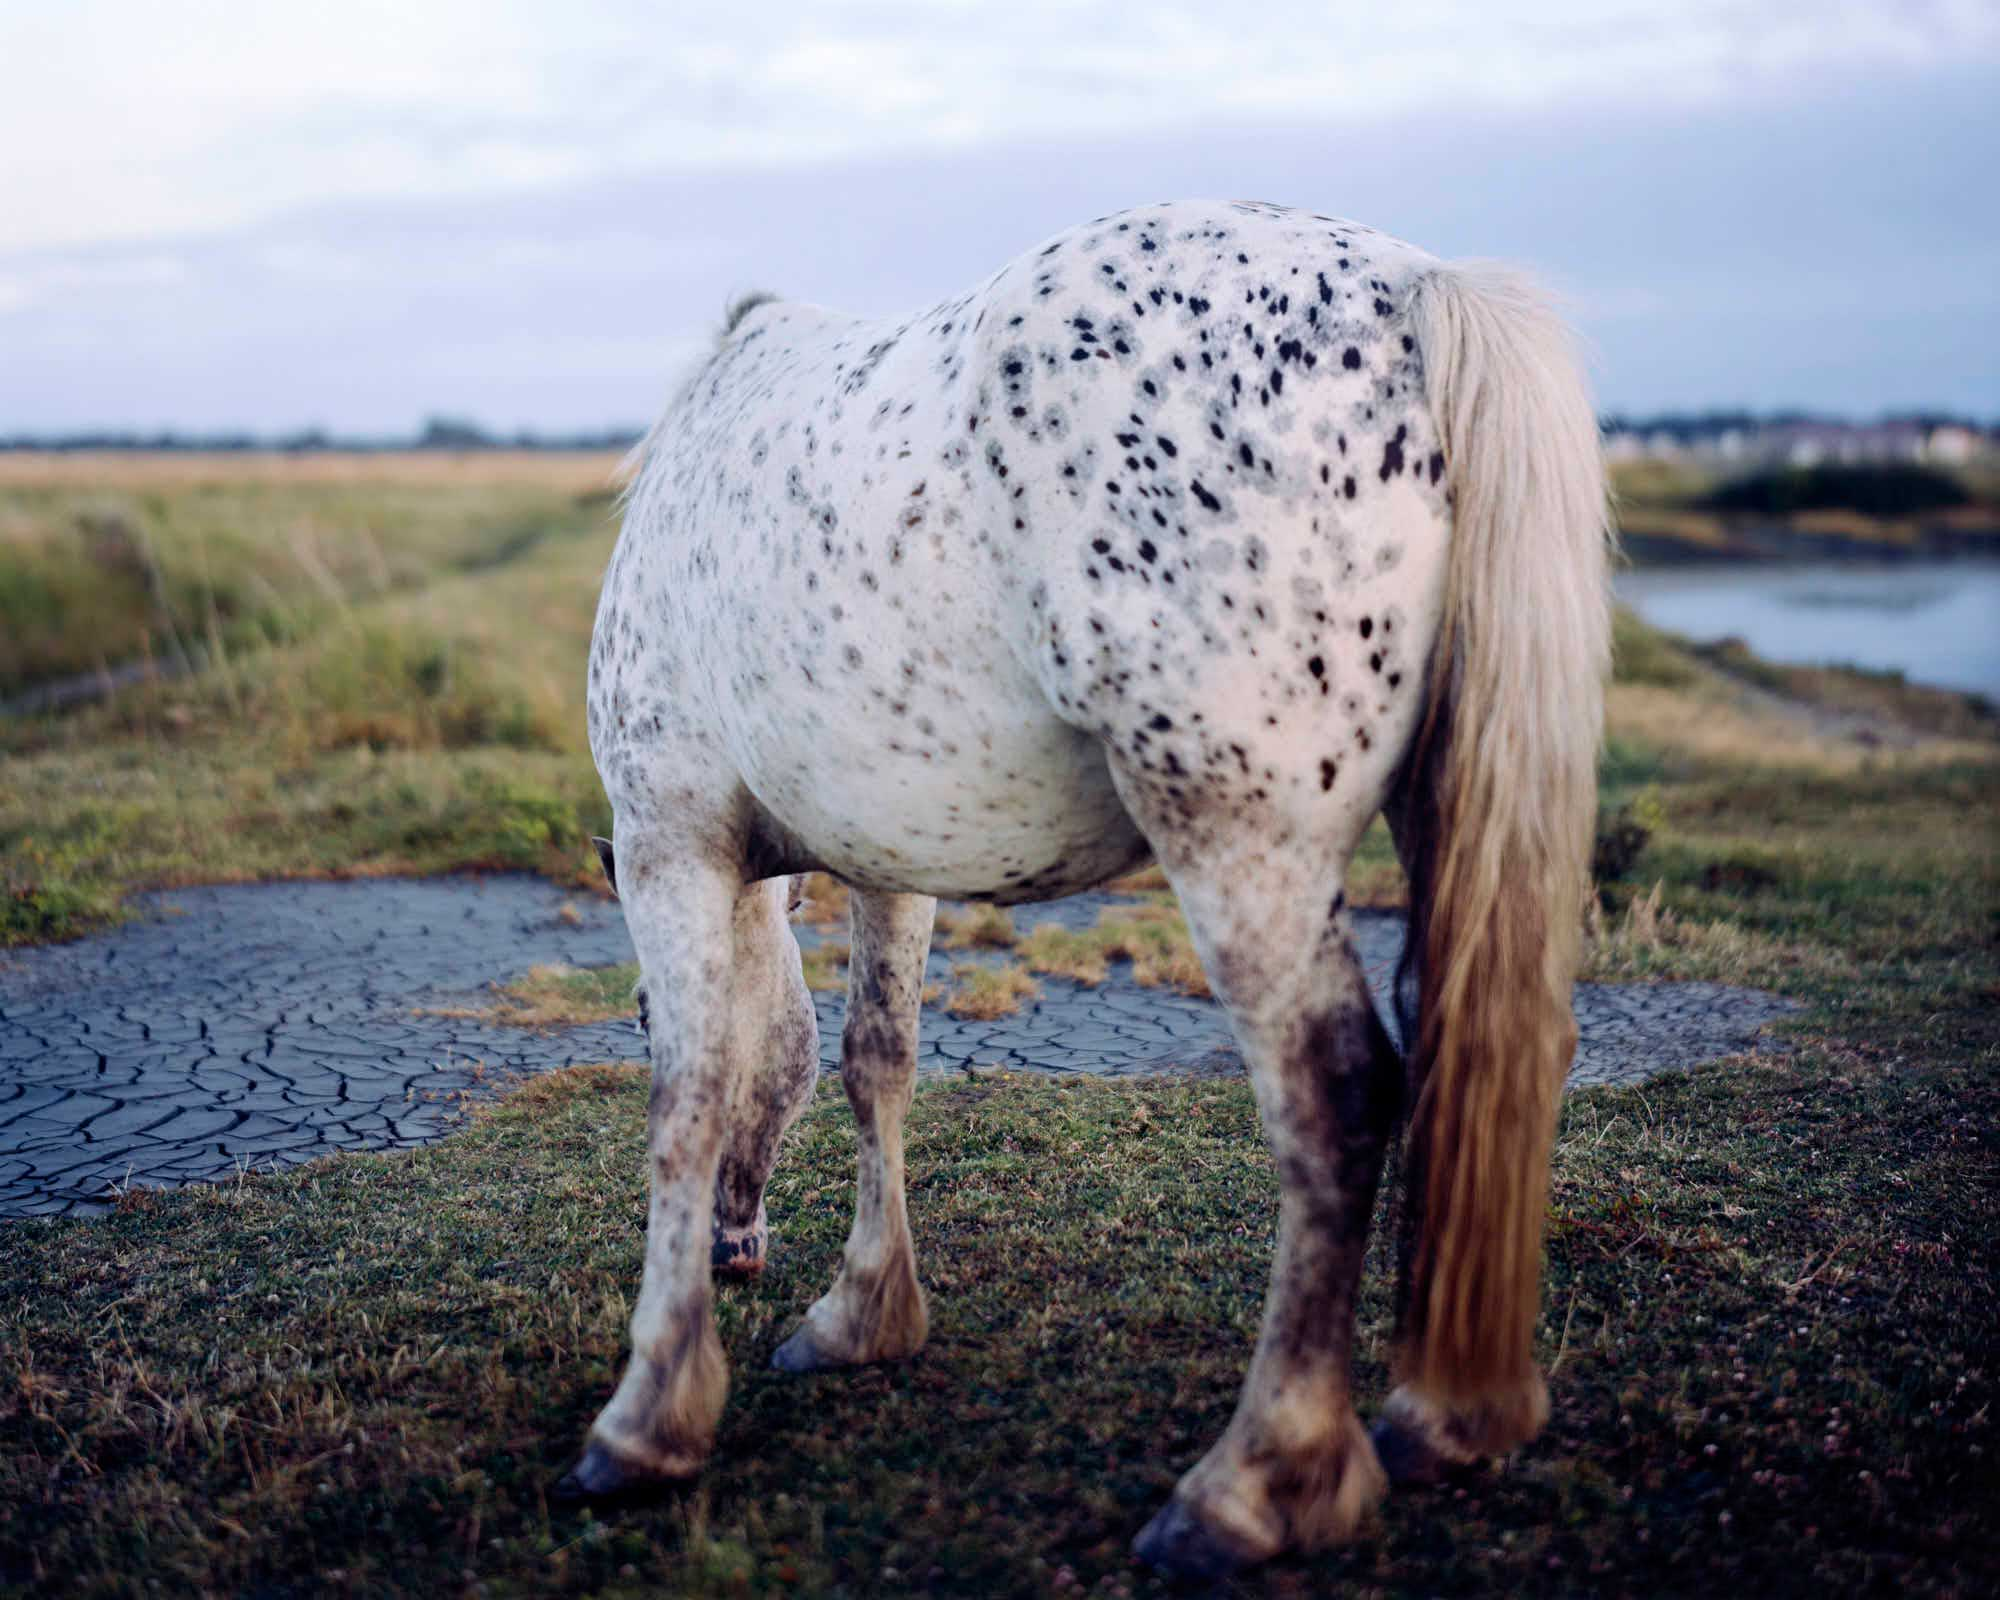 horse60x48inch11880.jpg